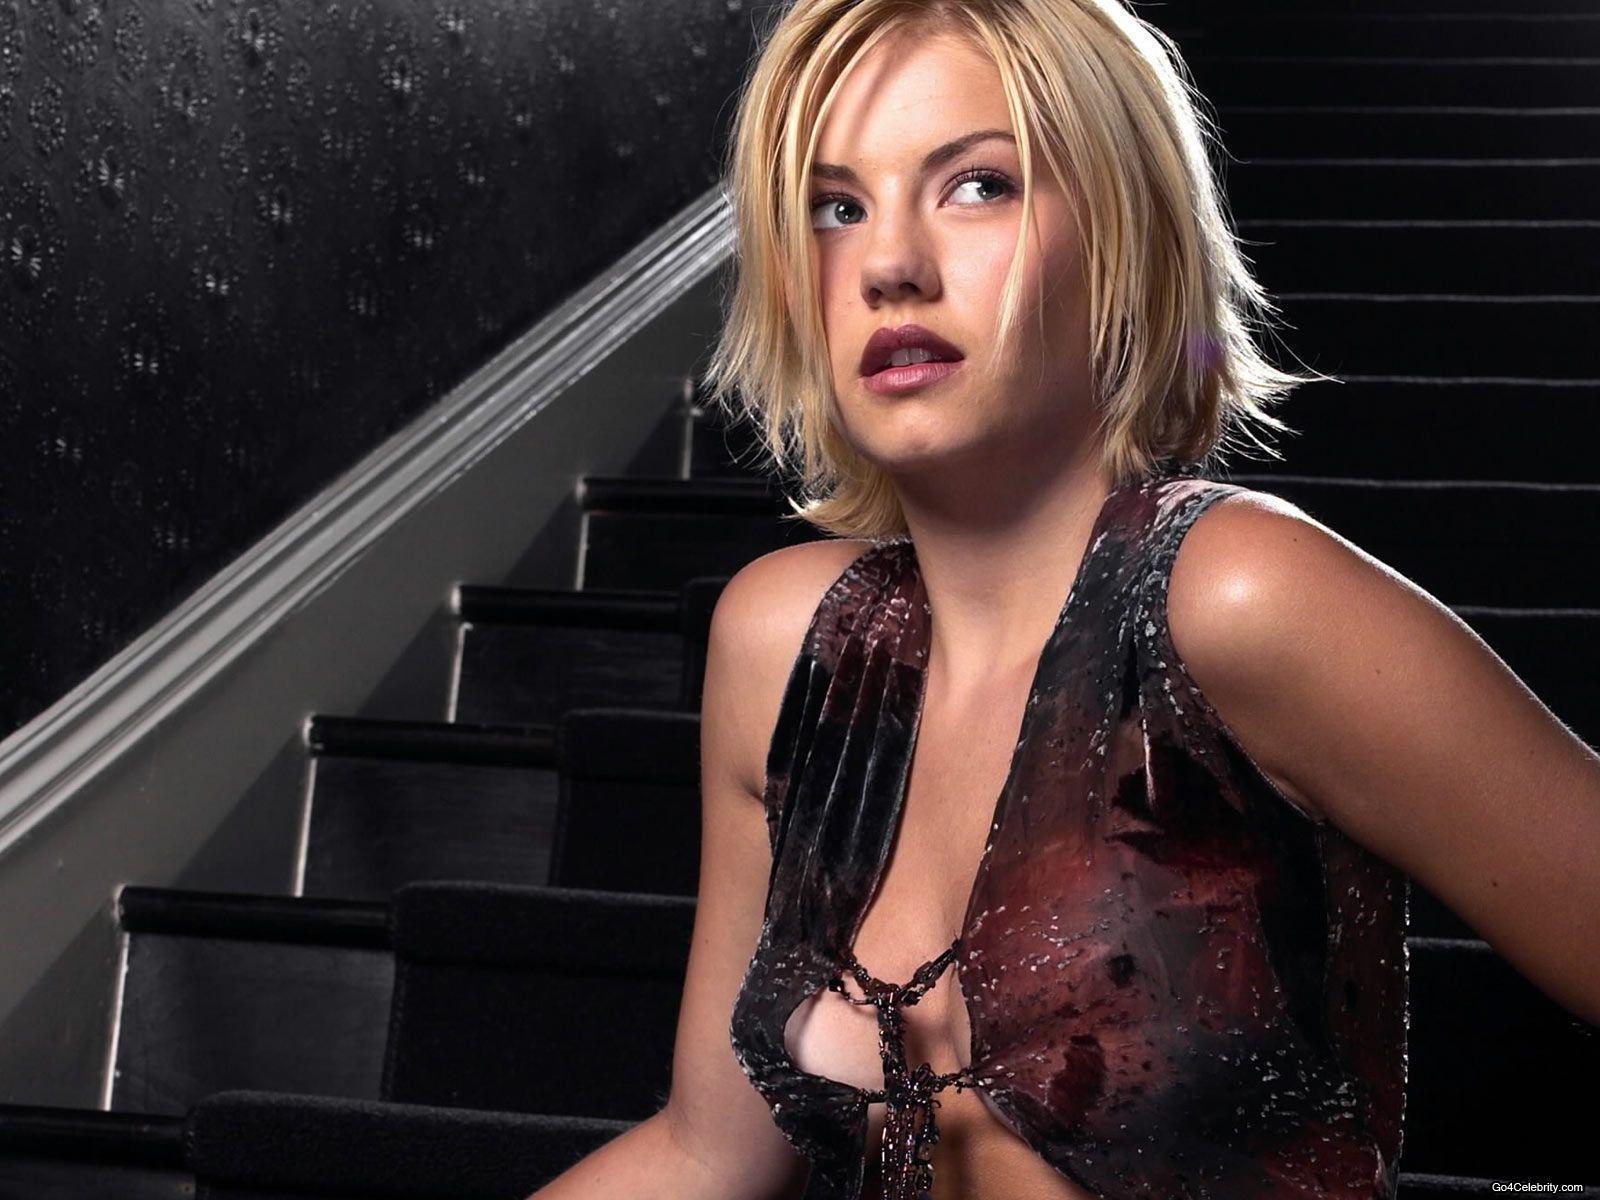 Elisha Cuthbert sexy gallery